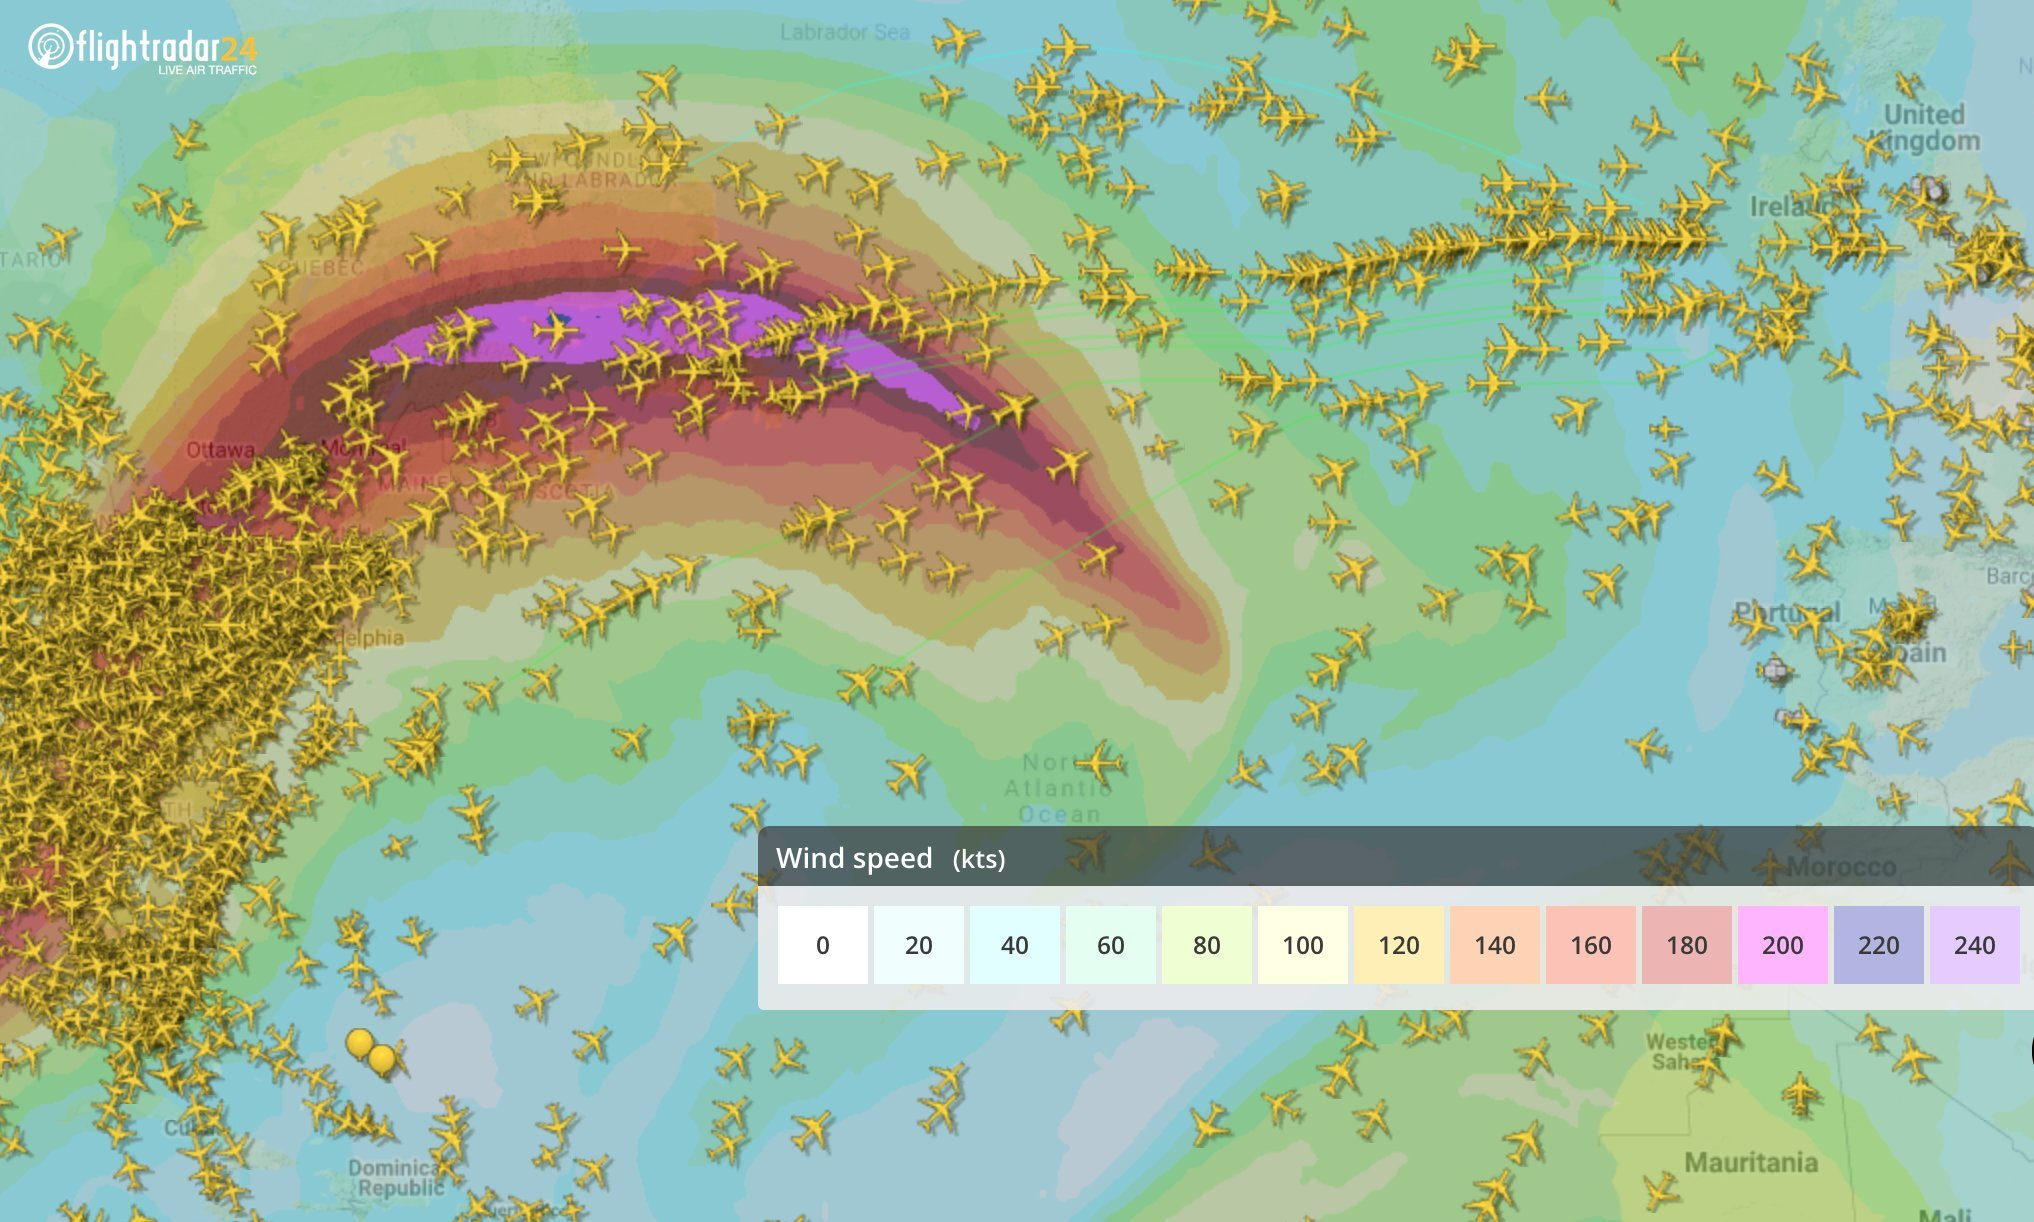 The North Atlantic jet stream